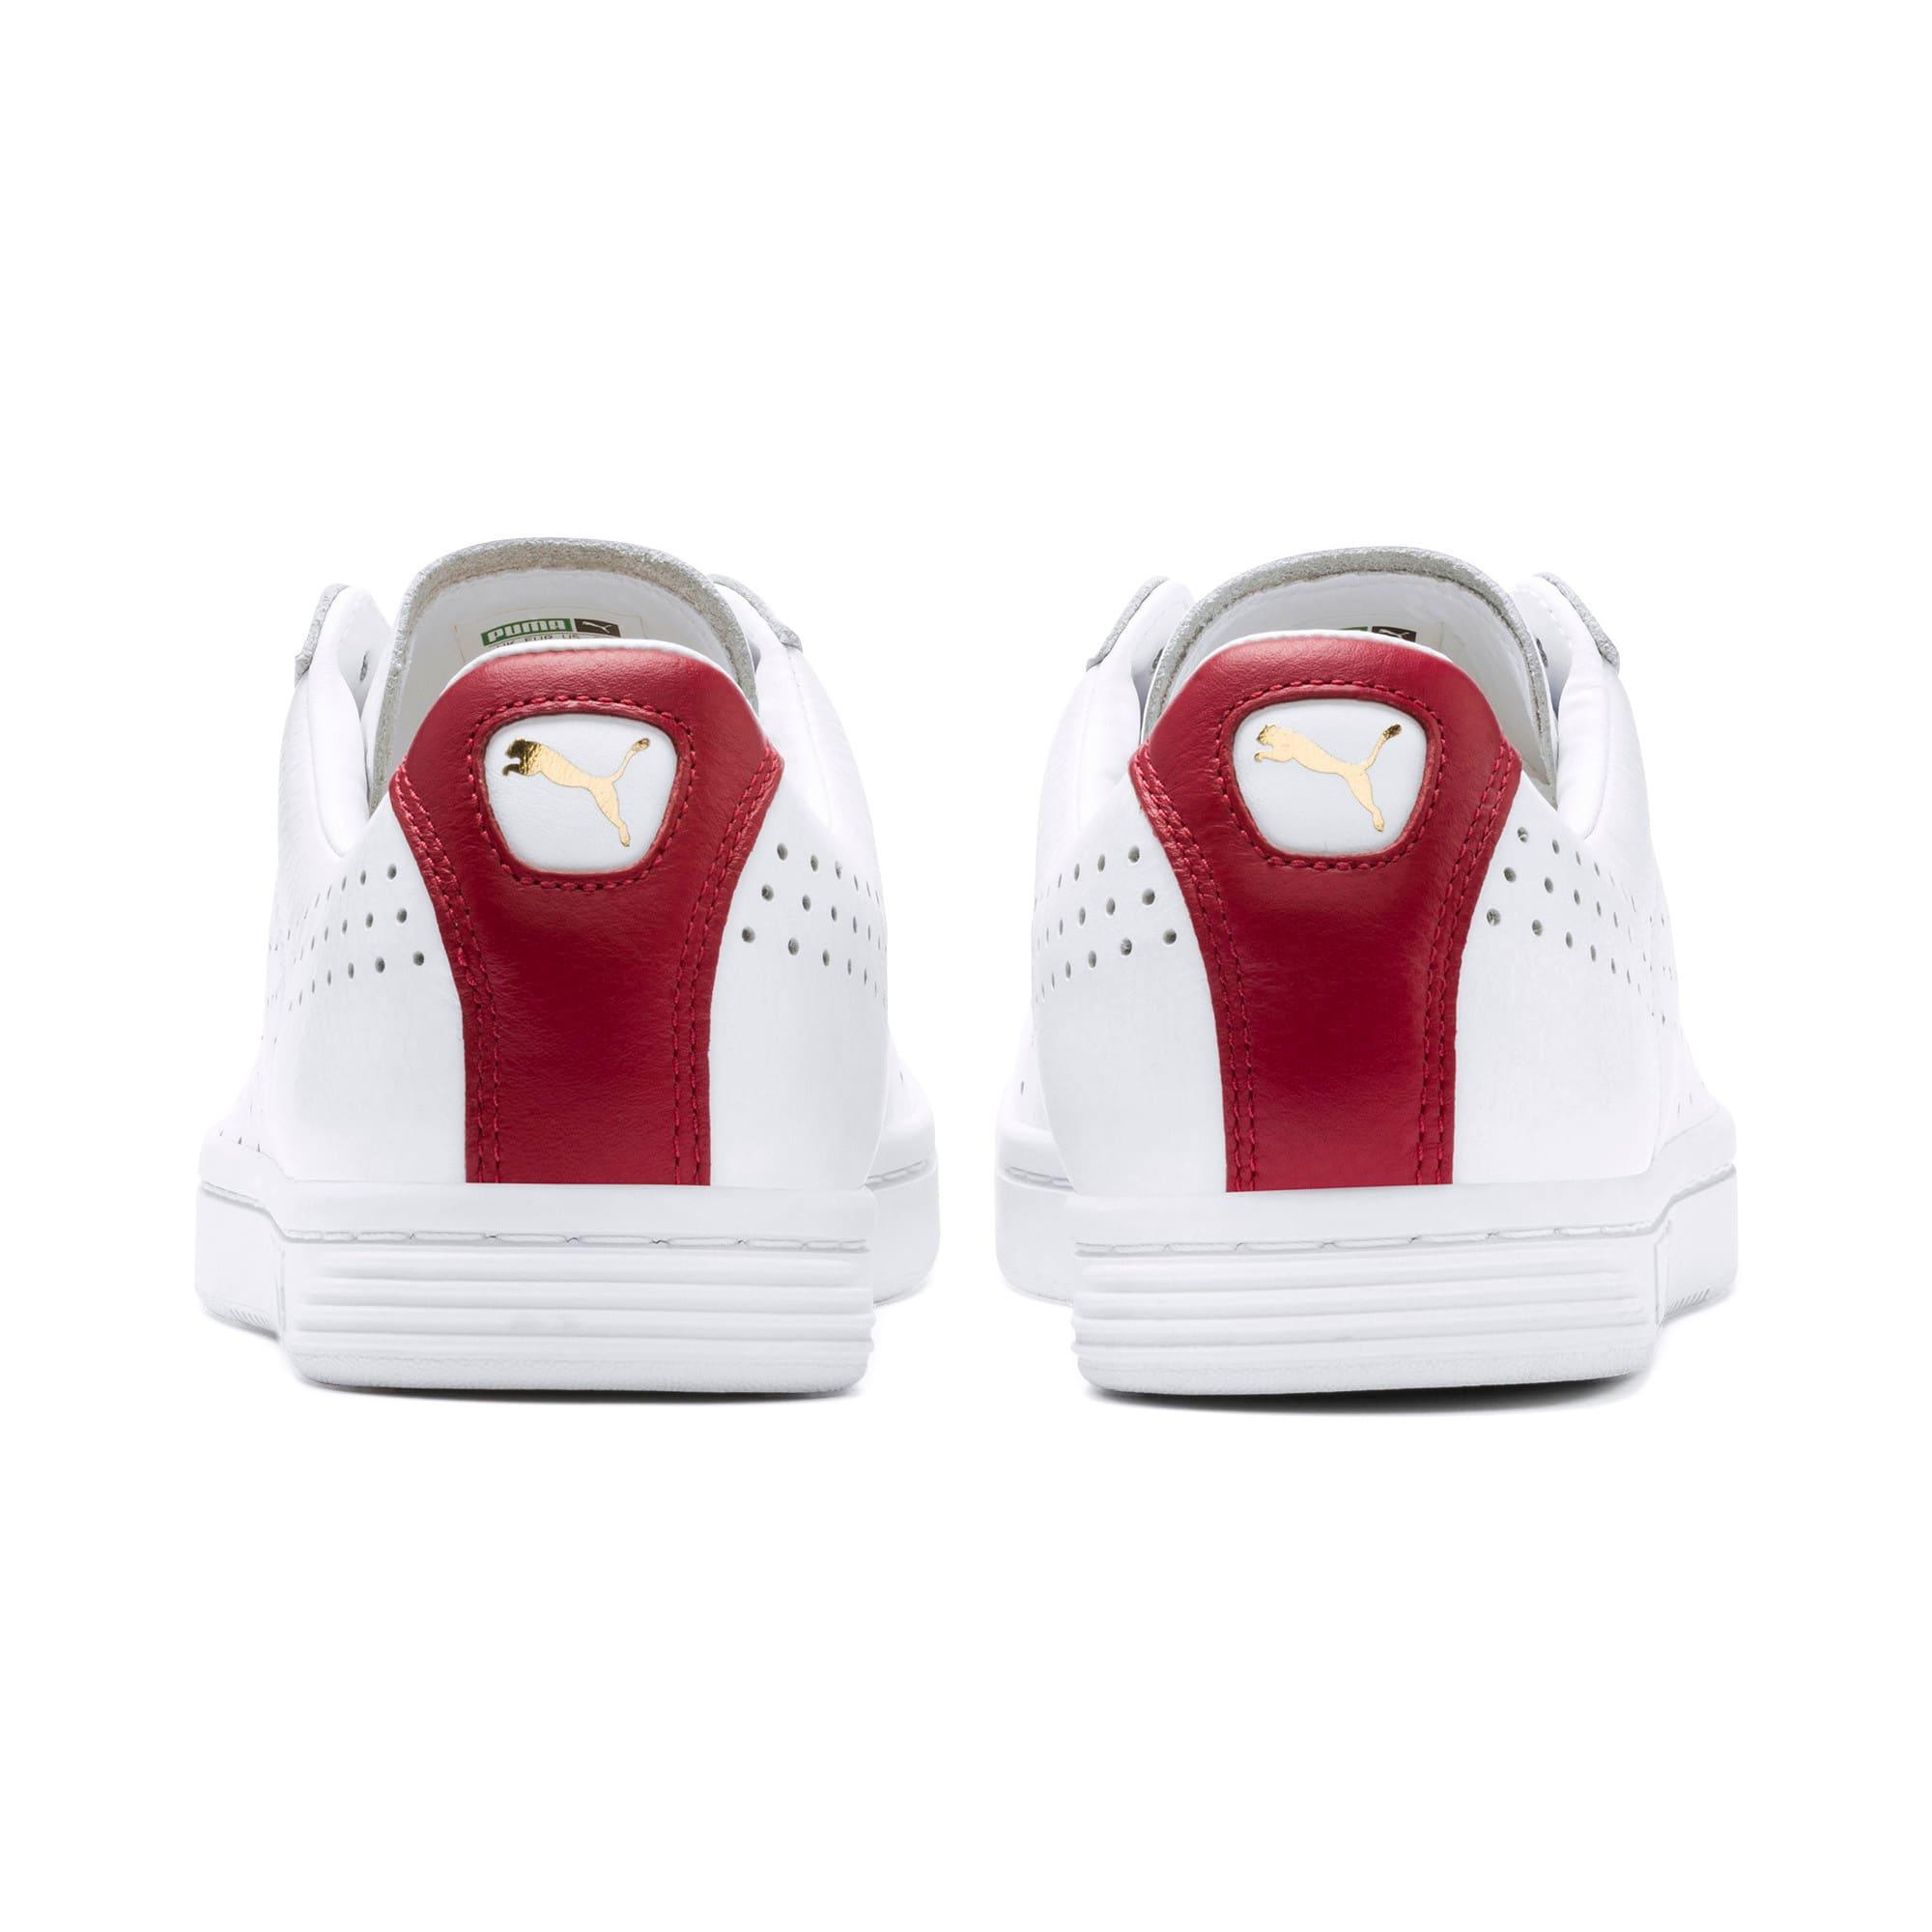 Thumbnail 5 of Court Star Sneakers, Puma White-Rhubarb, medium